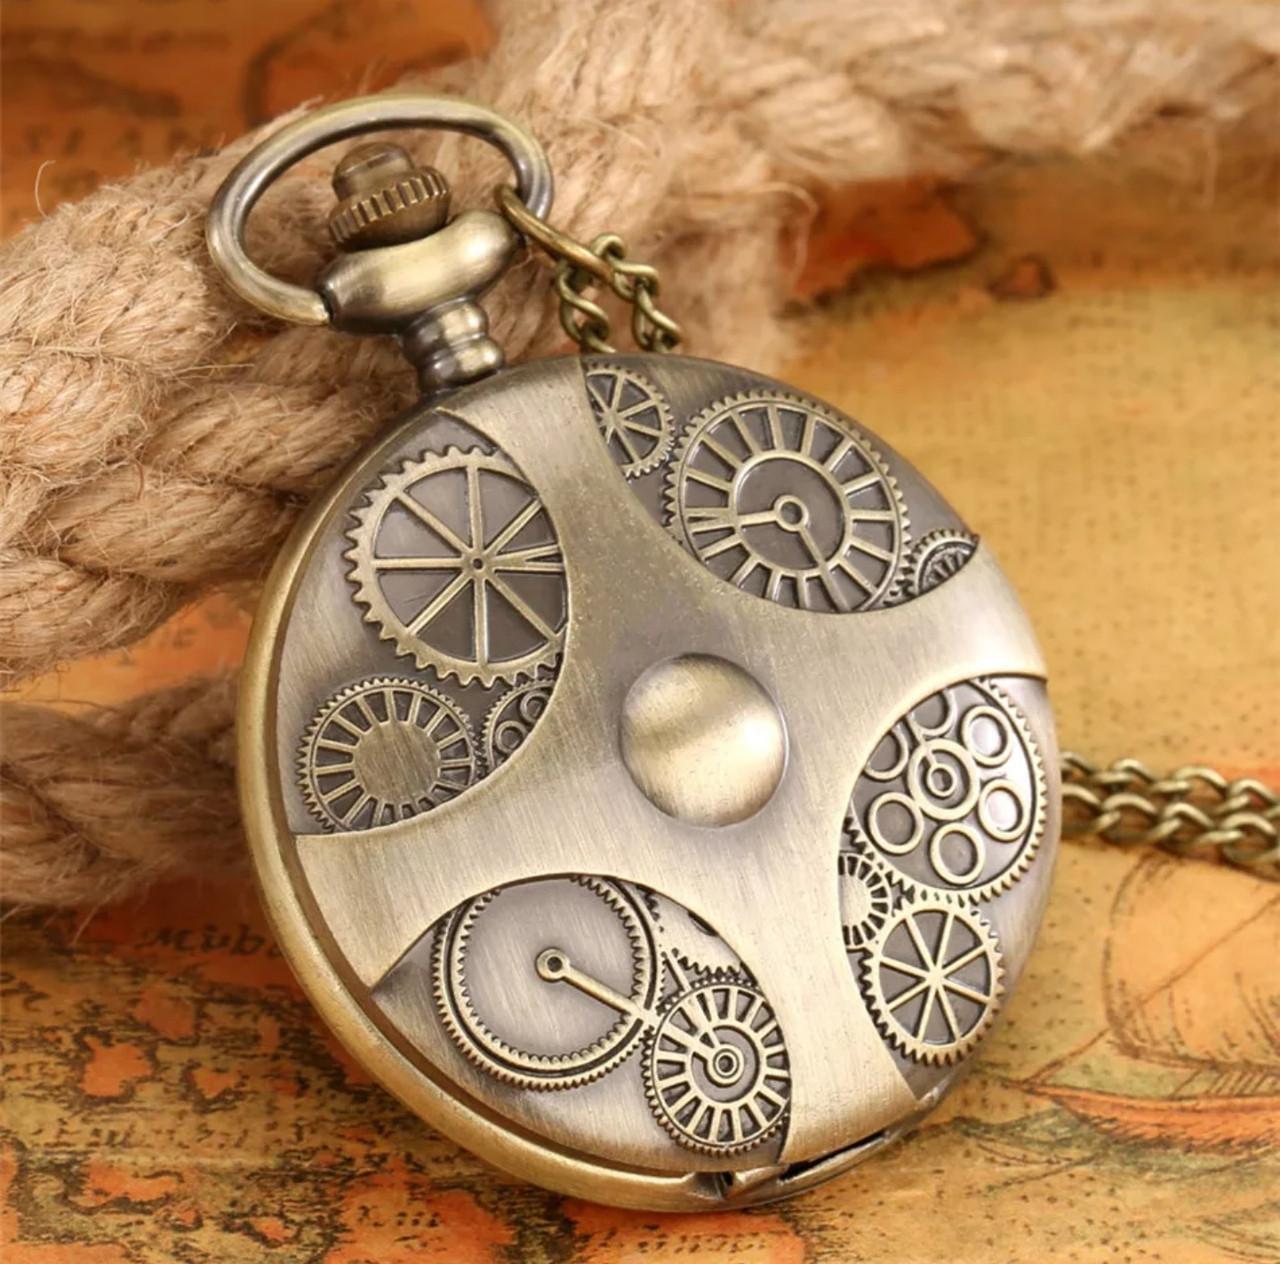 Мужские часы карманные на цепочке